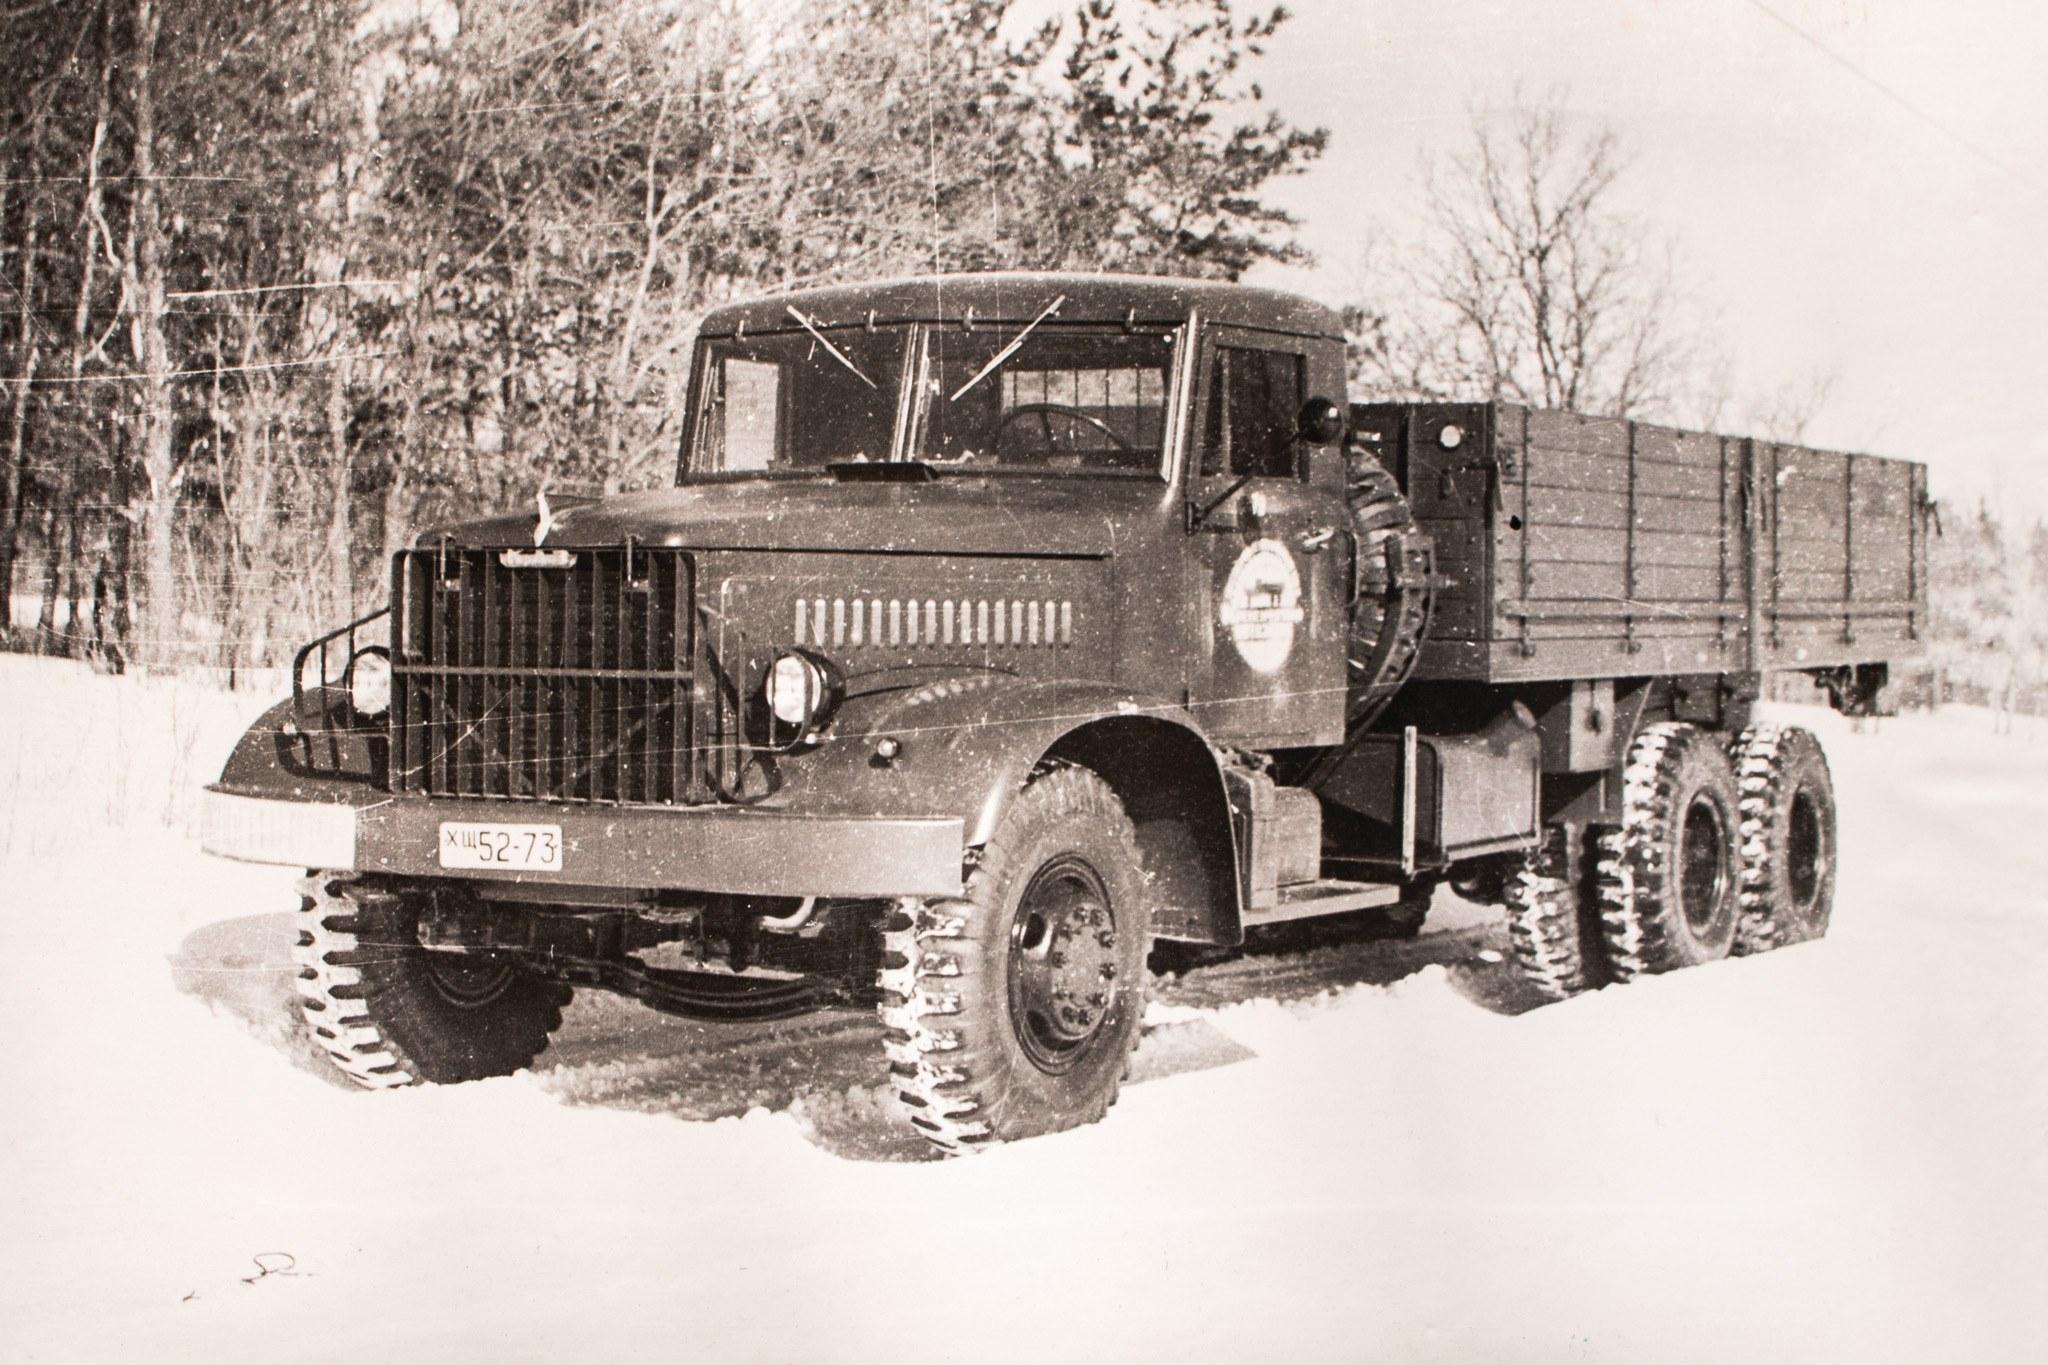 Kraz-219-1959